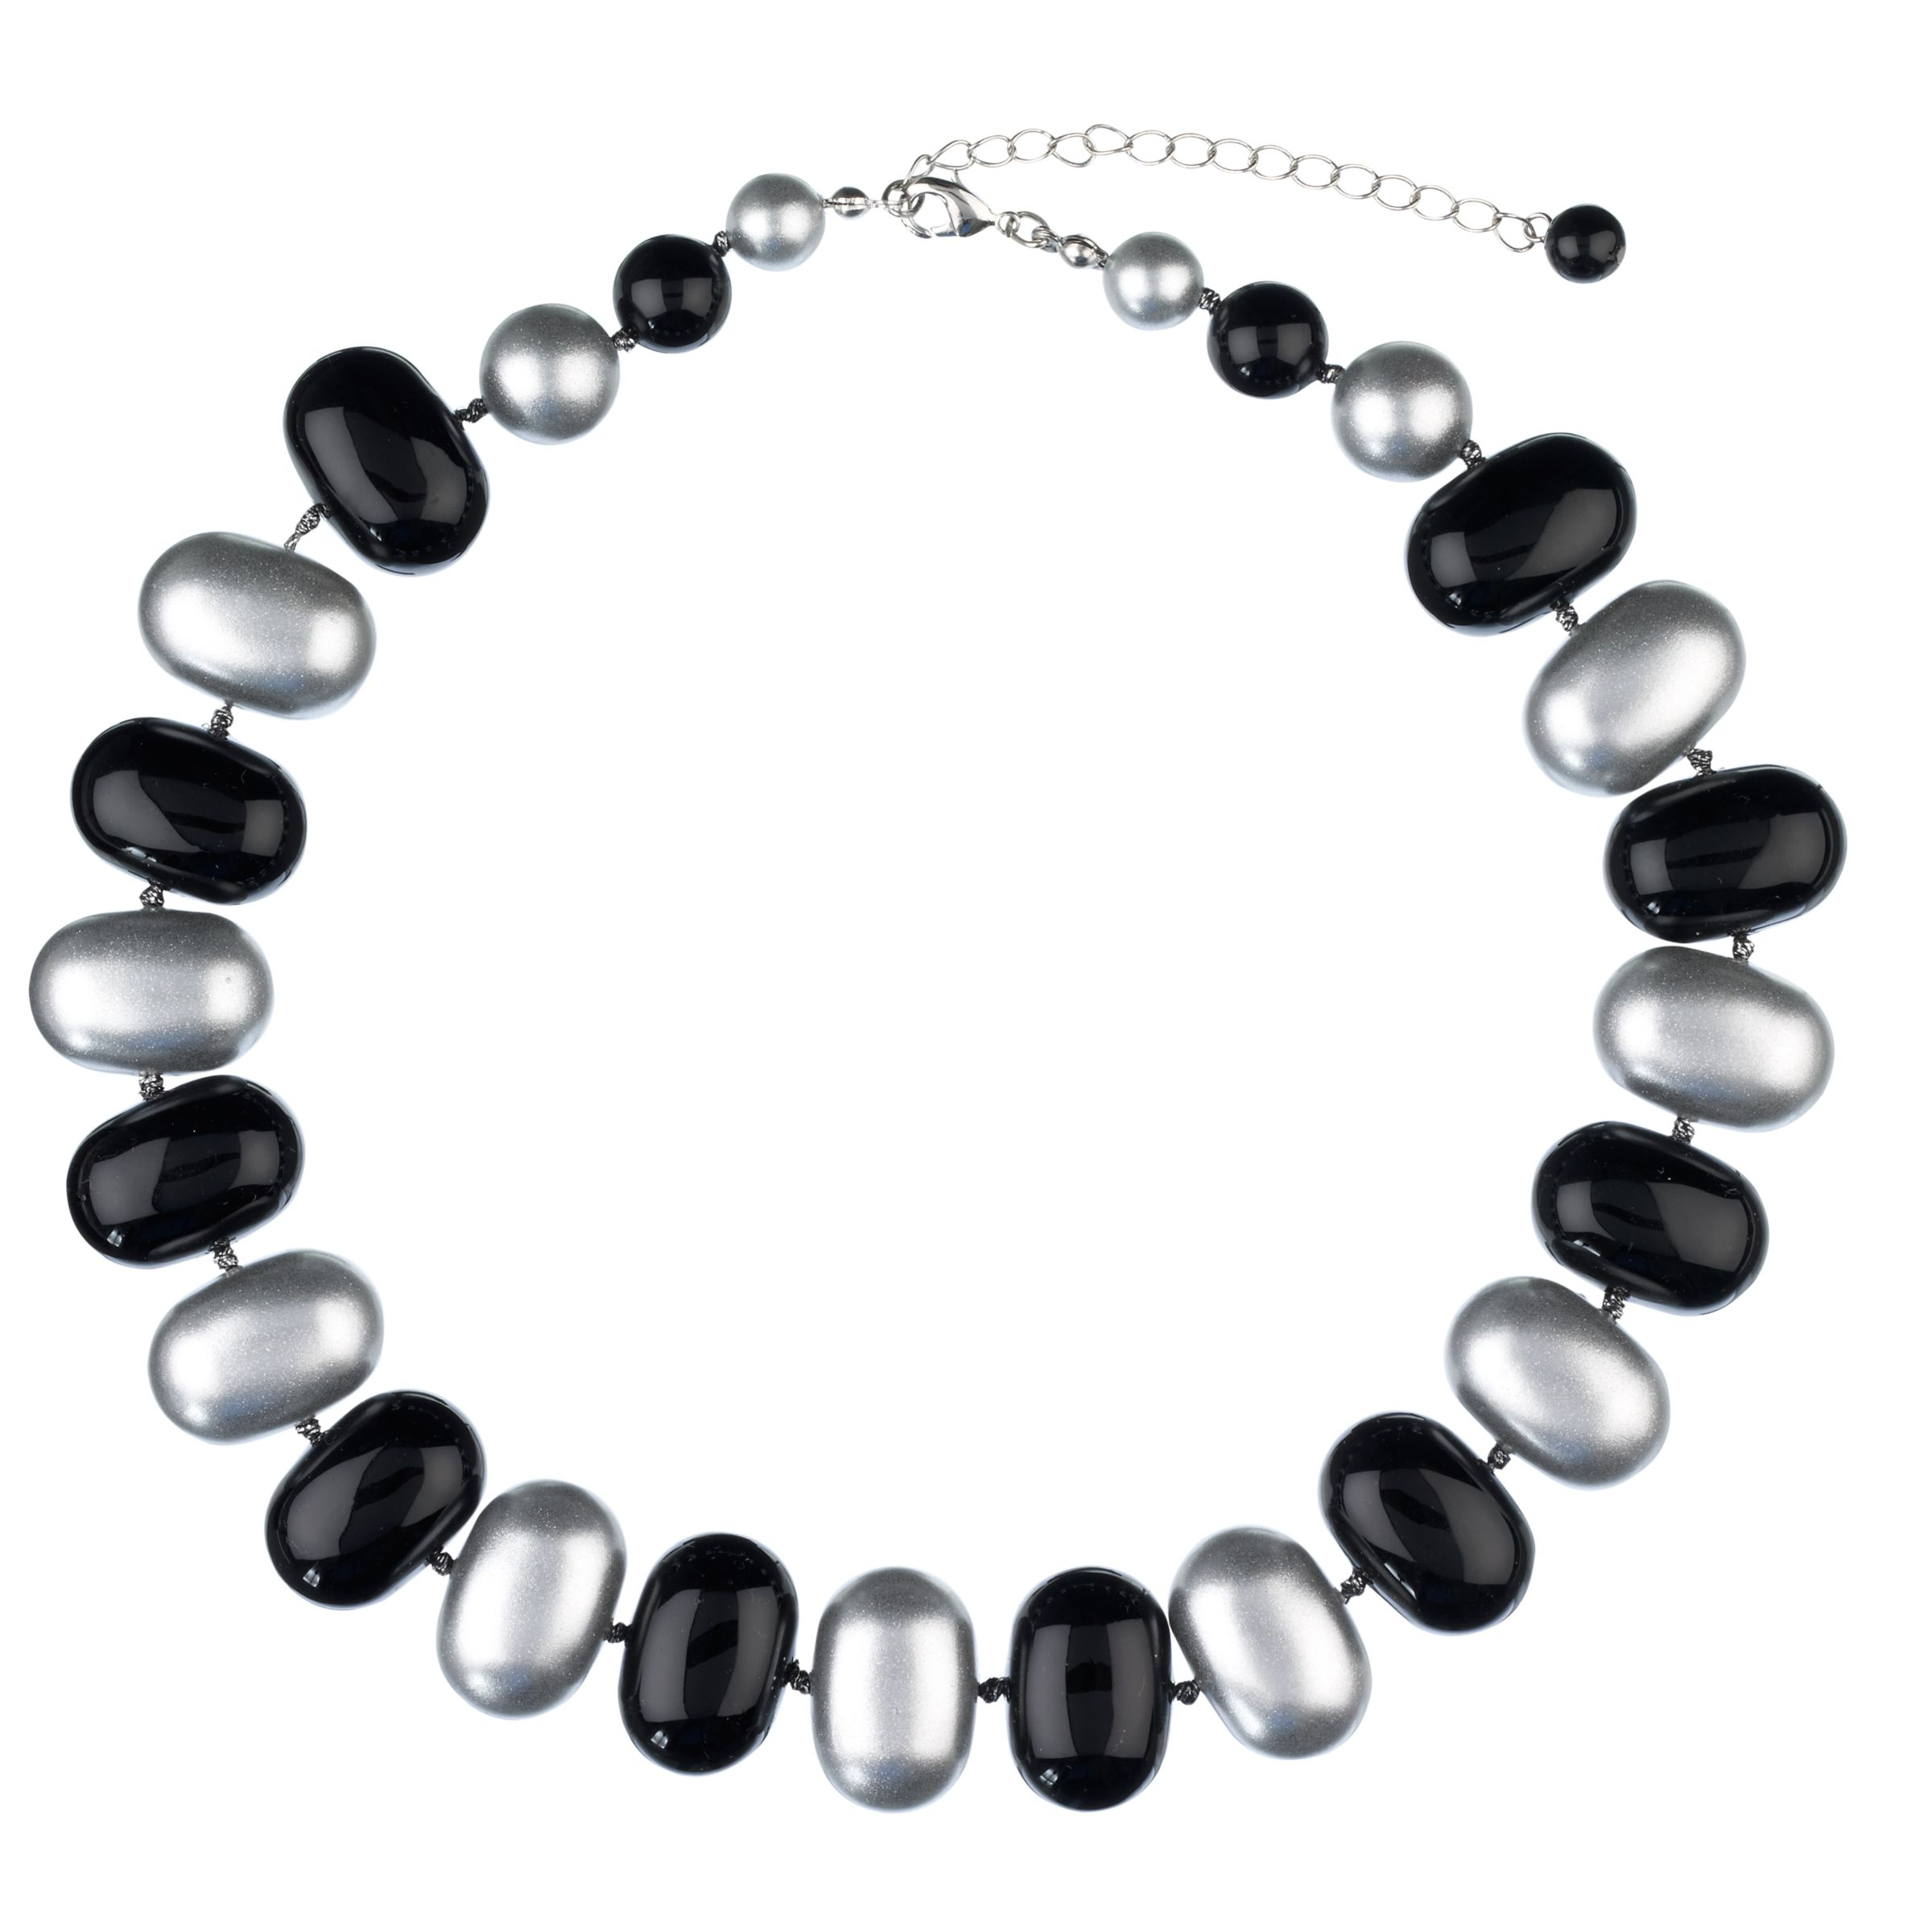 John Lewis Women Acrylic Bead Necklace, Silver/Black